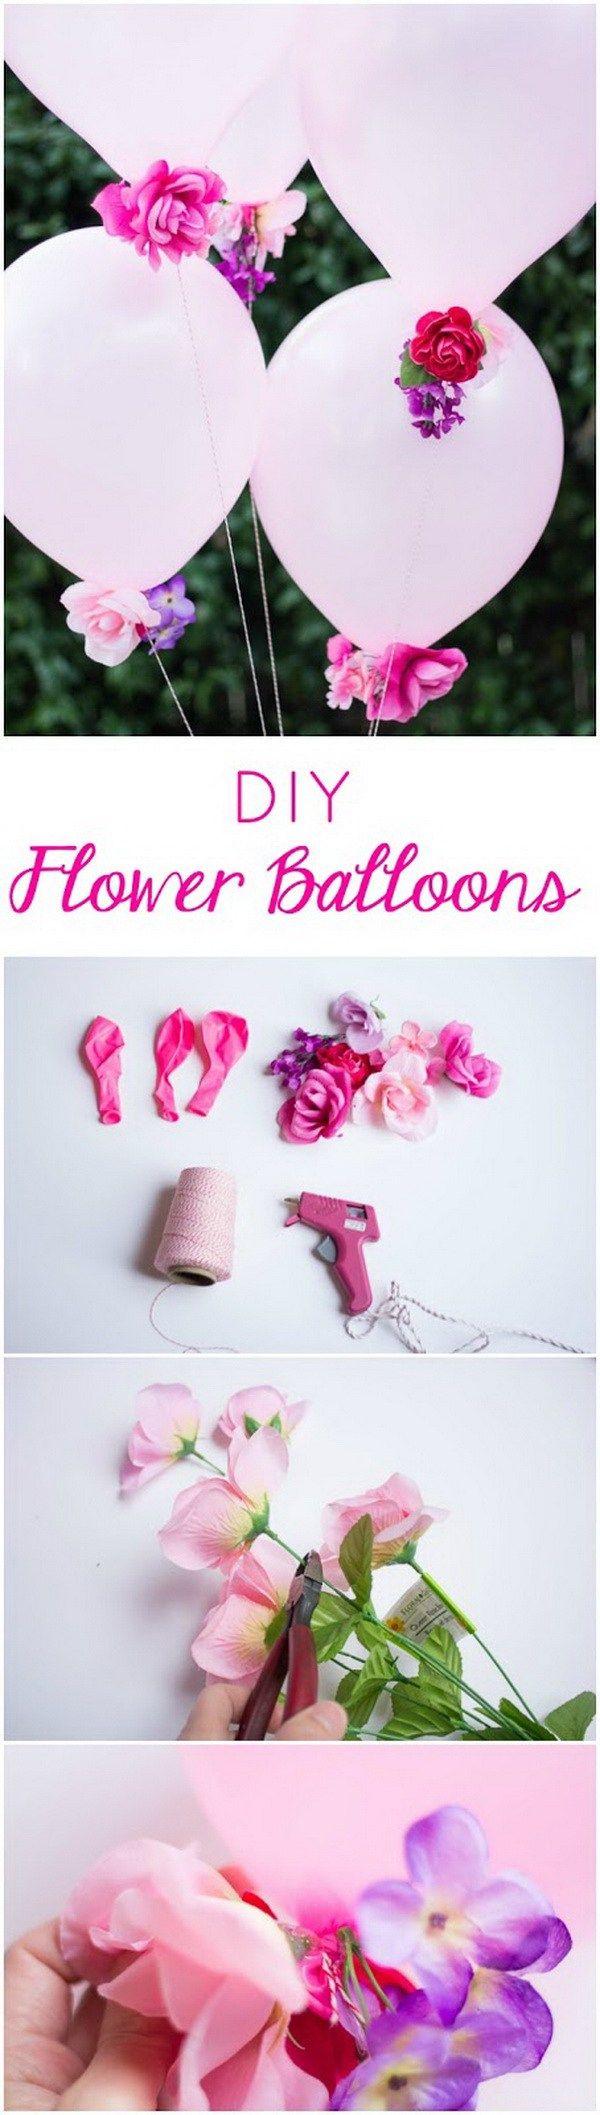 DIY Flower Balloons. Ptretty balloon decoration ideas.